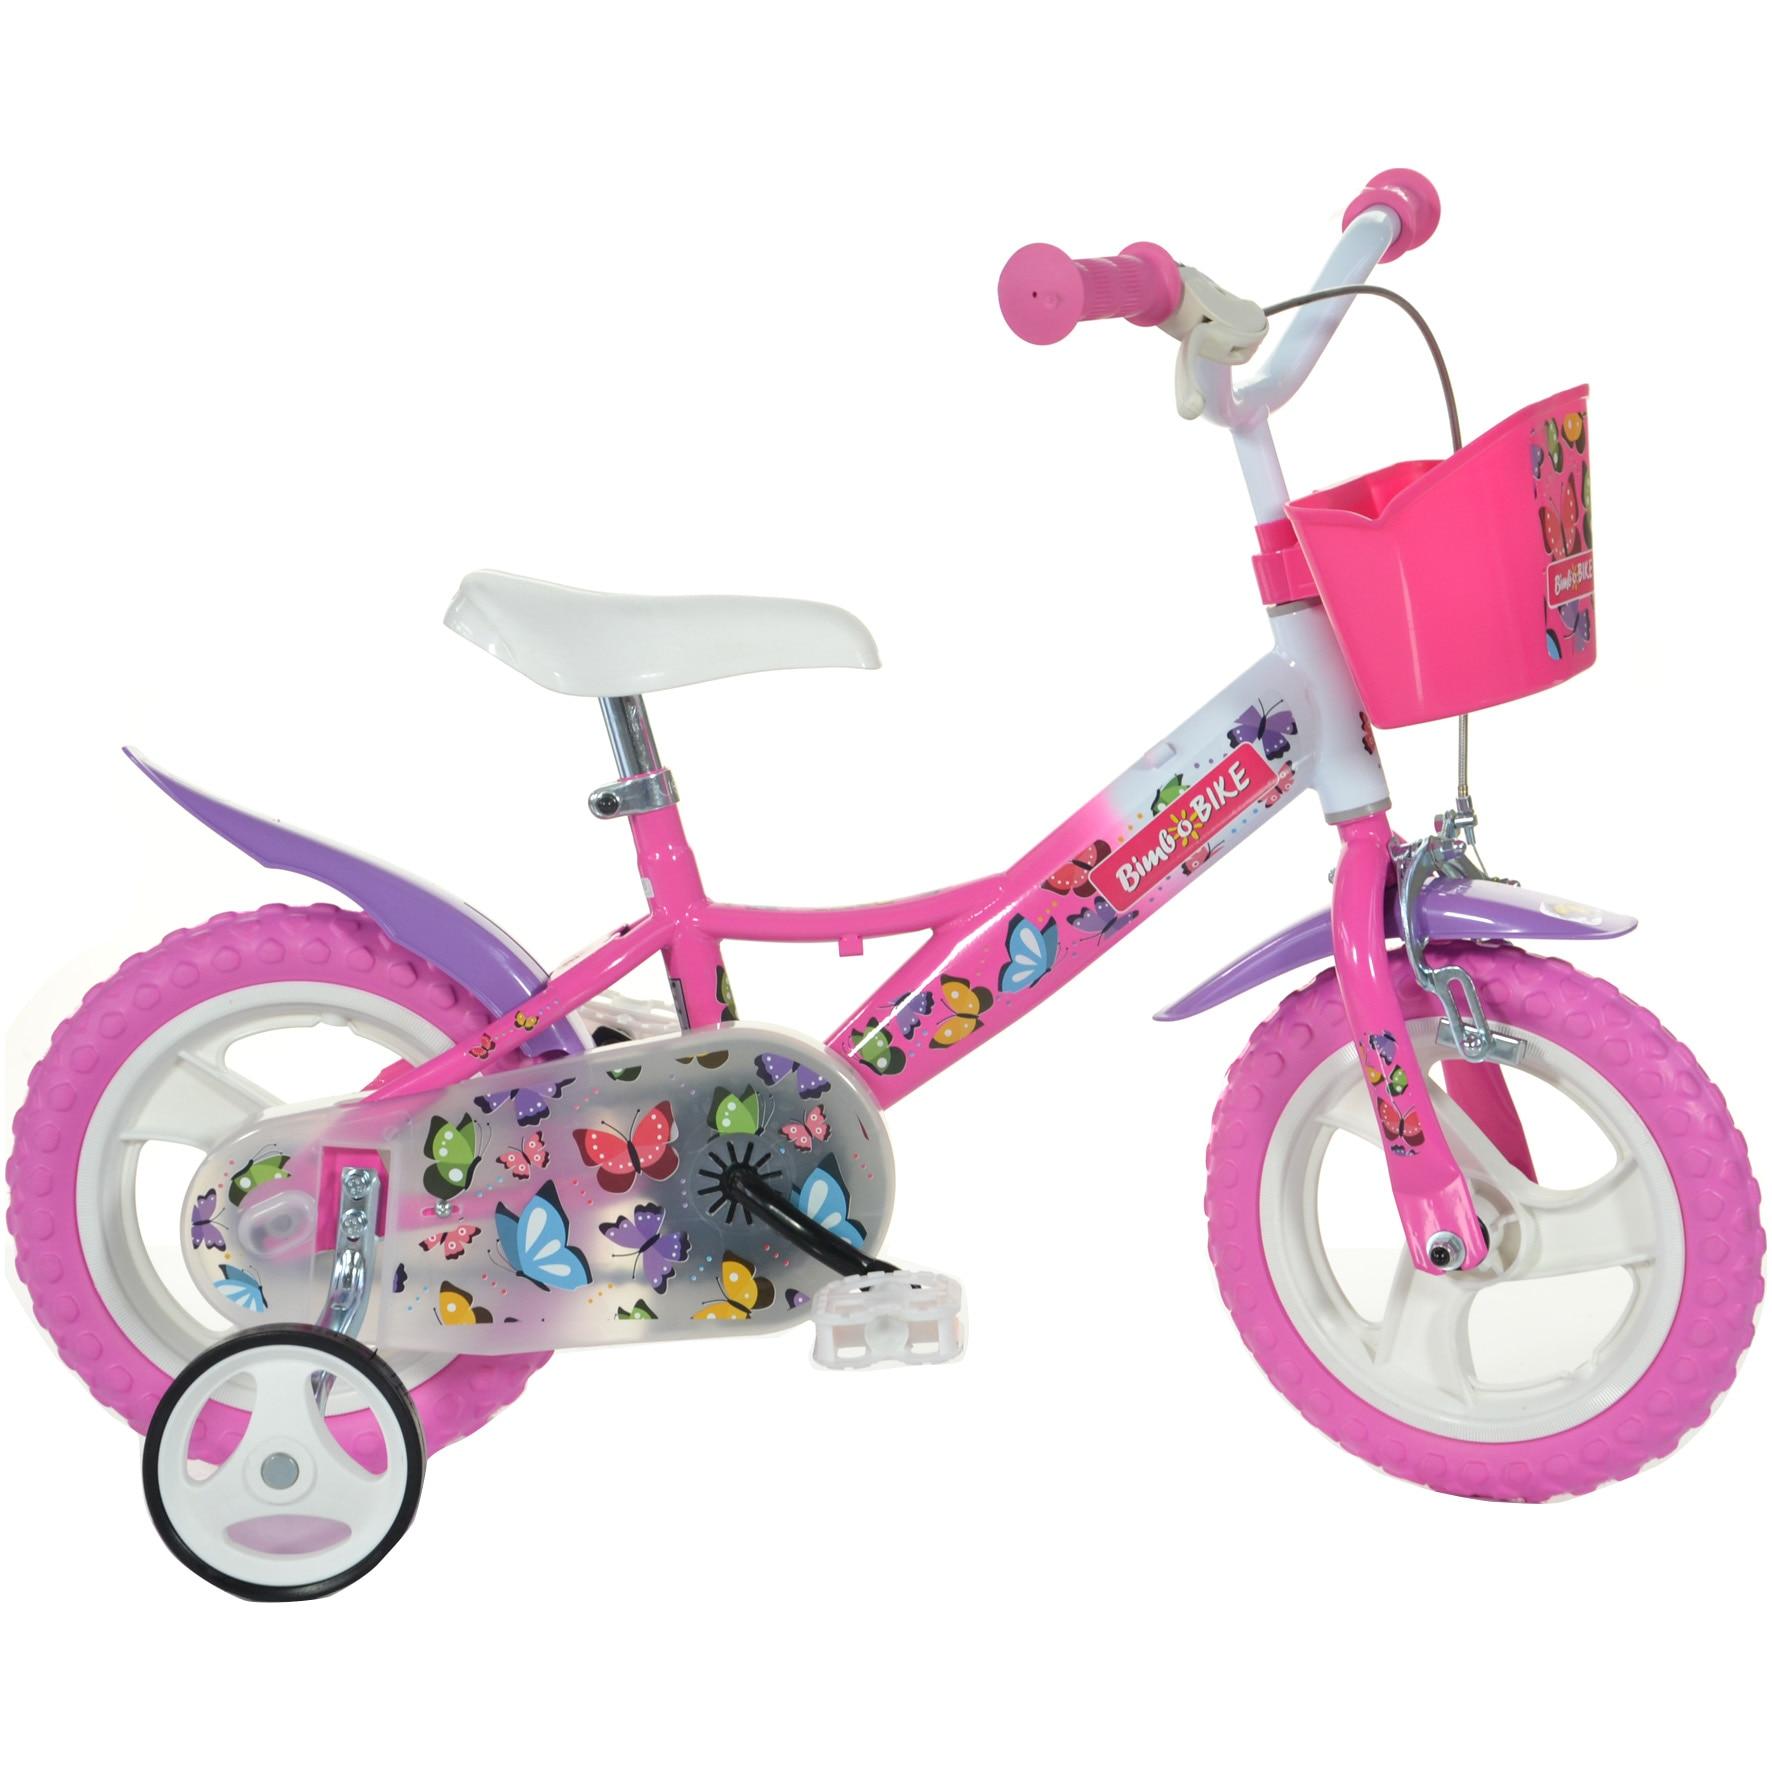 "Fotografie Bicicleta B Bike Butterfly MTB 12"" pentru fete, Roz/Alb/Mov, 1S"